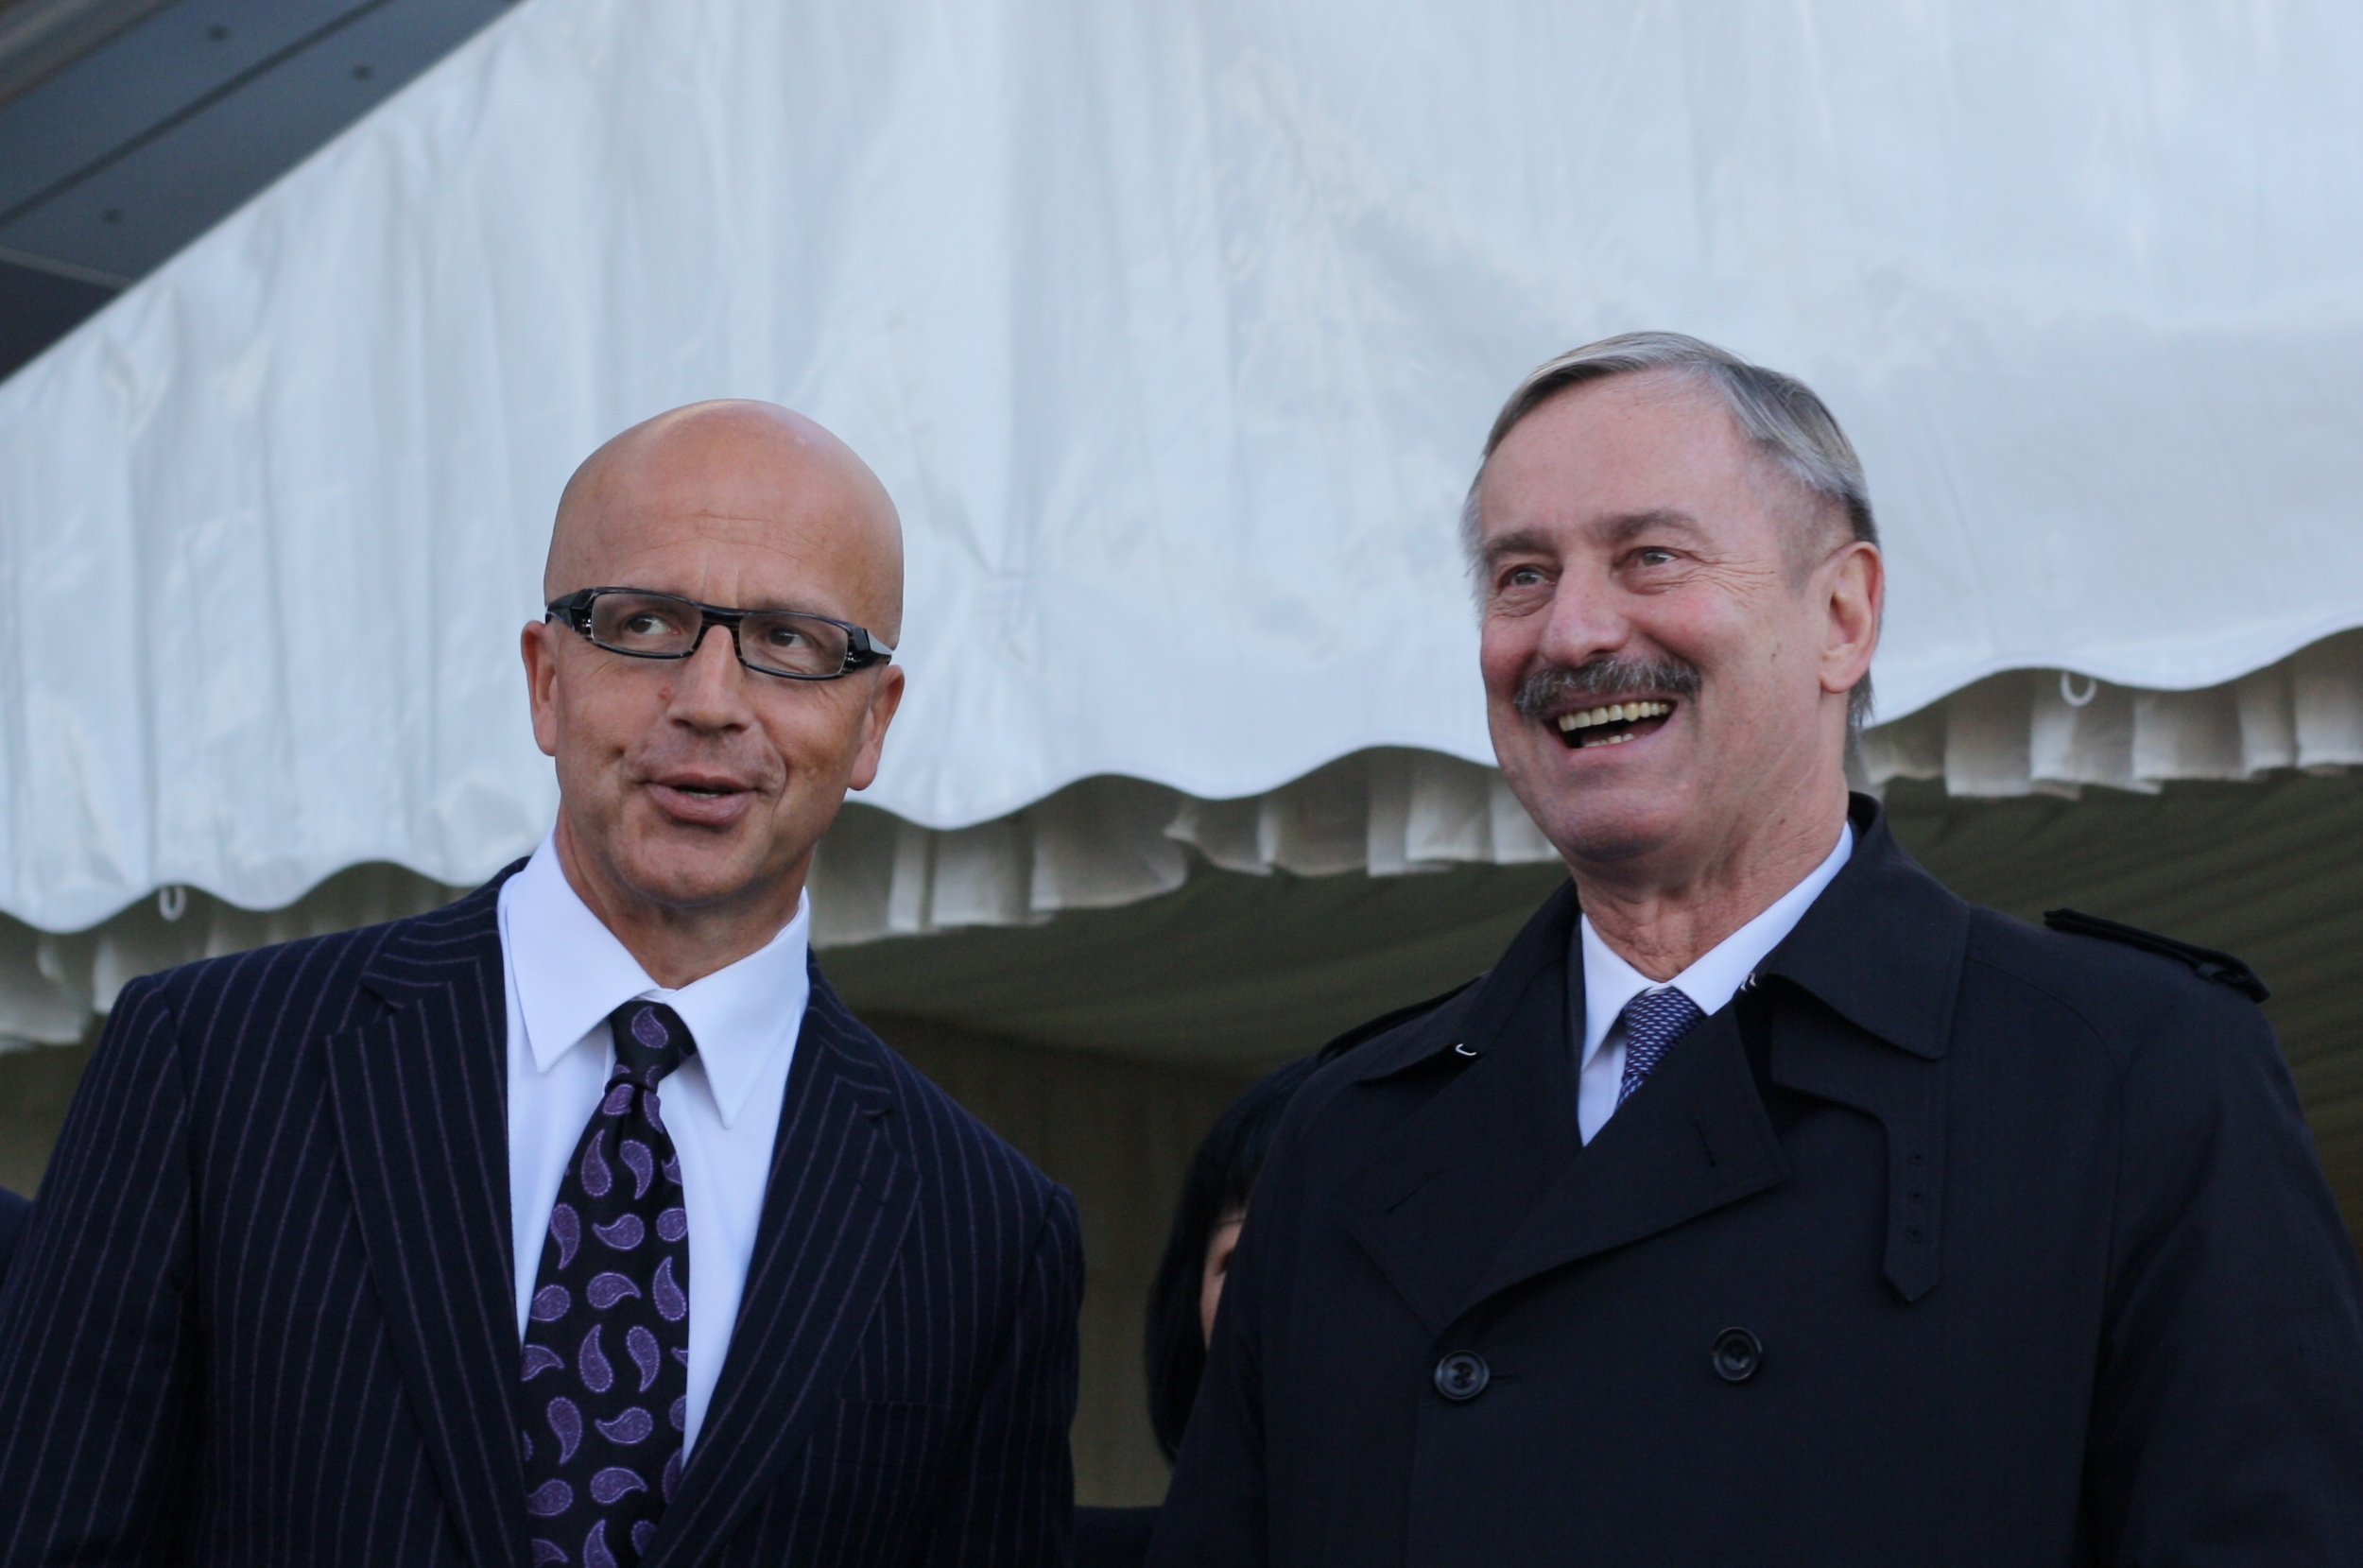 Commissioner Siim Kallas (right) andRail Baltic European Coordinator Pavel Telička at the TEN-T Days in Tallinn in October 2013. Photo: Dima Stepanchuk.